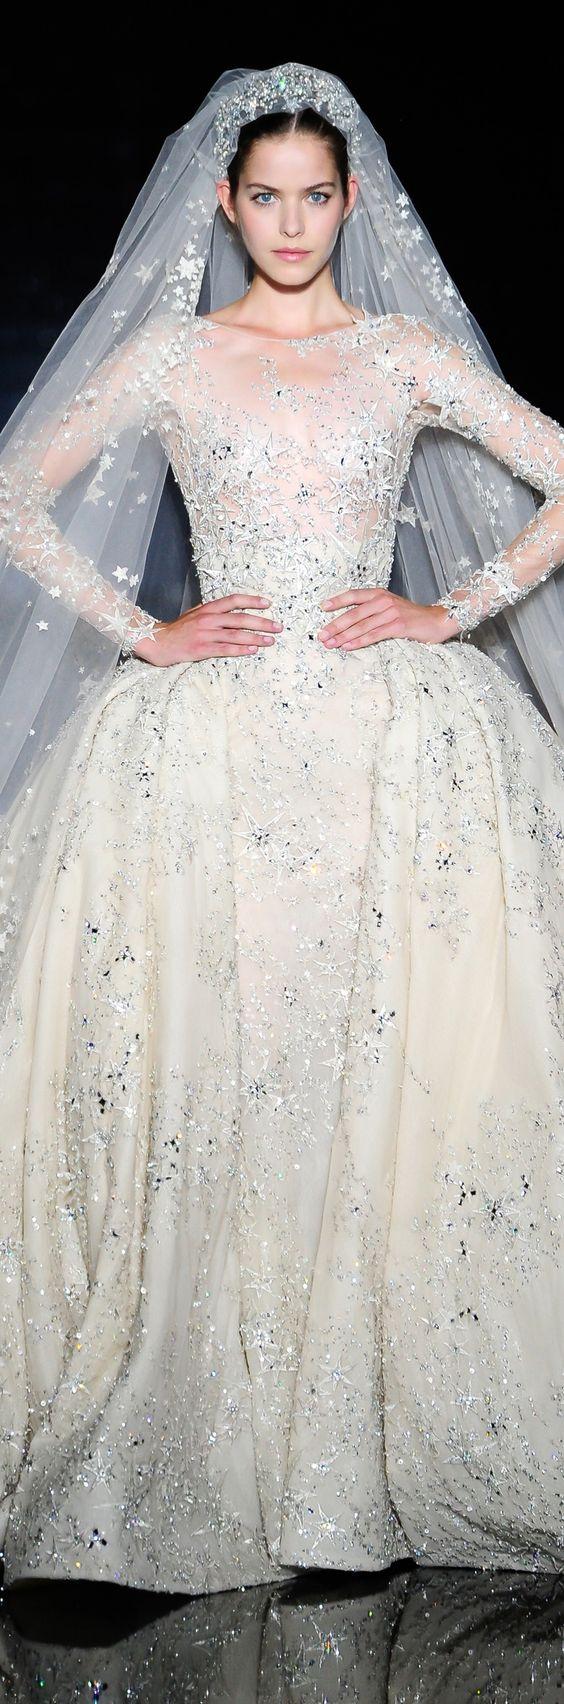 Celestial Inspiration Cosmic Wedding Dresses For Moon